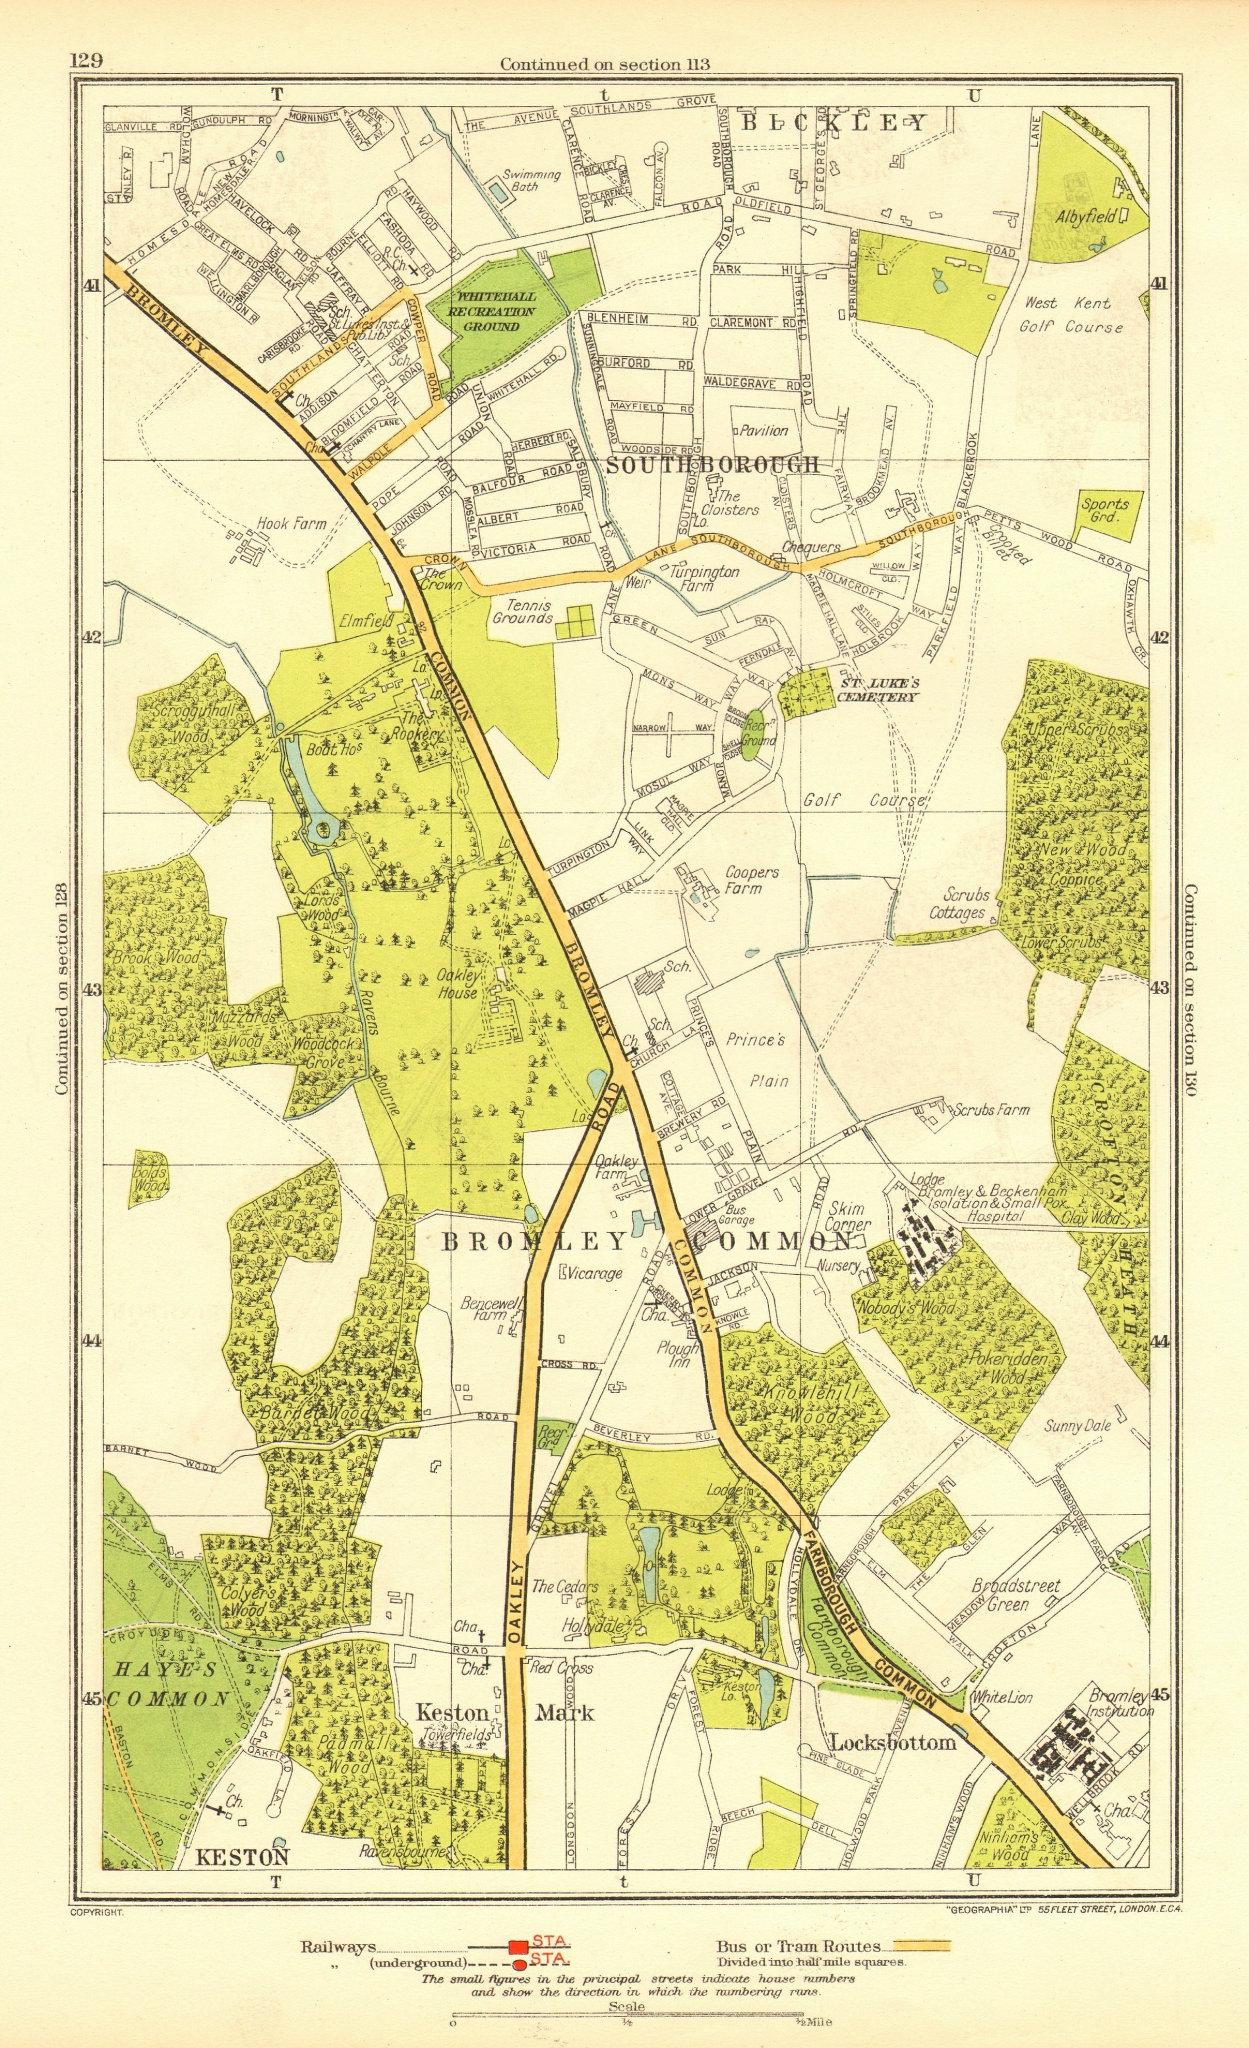 Associate Product BROMLEY COMMON. Keston Keston Mark Locksbottom Southborough Bromley 1937 map